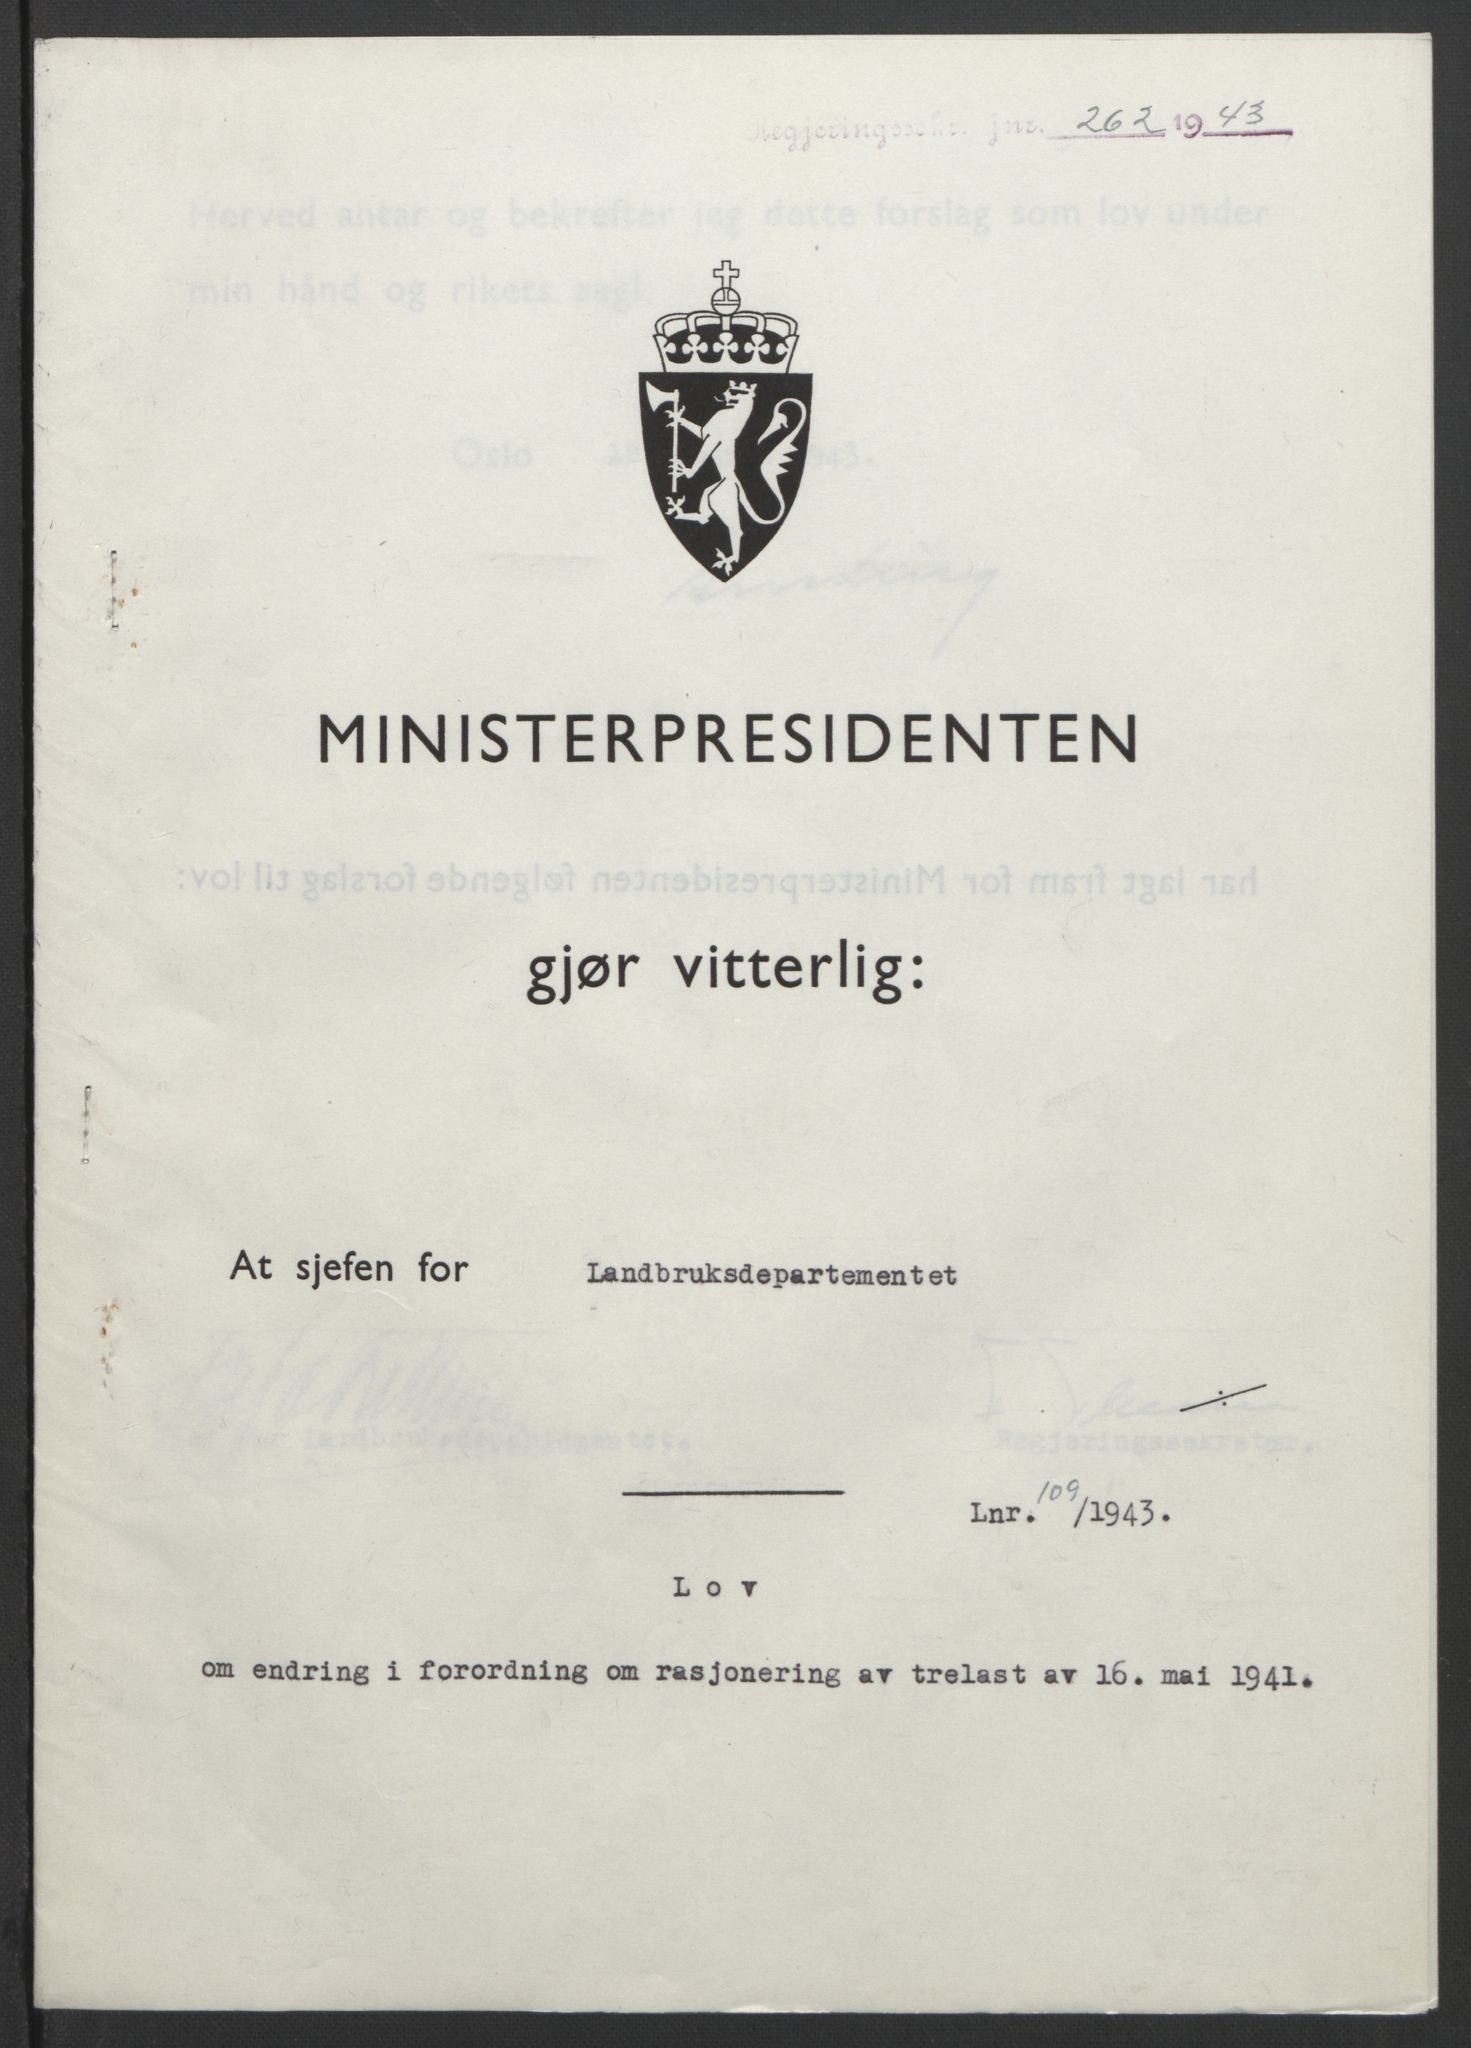 RA, NS-administrasjonen 1940-1945 (Statsrådsekretariatet, de kommisariske statsråder mm), D/Db/L0099: Lover, 1943, s. 509